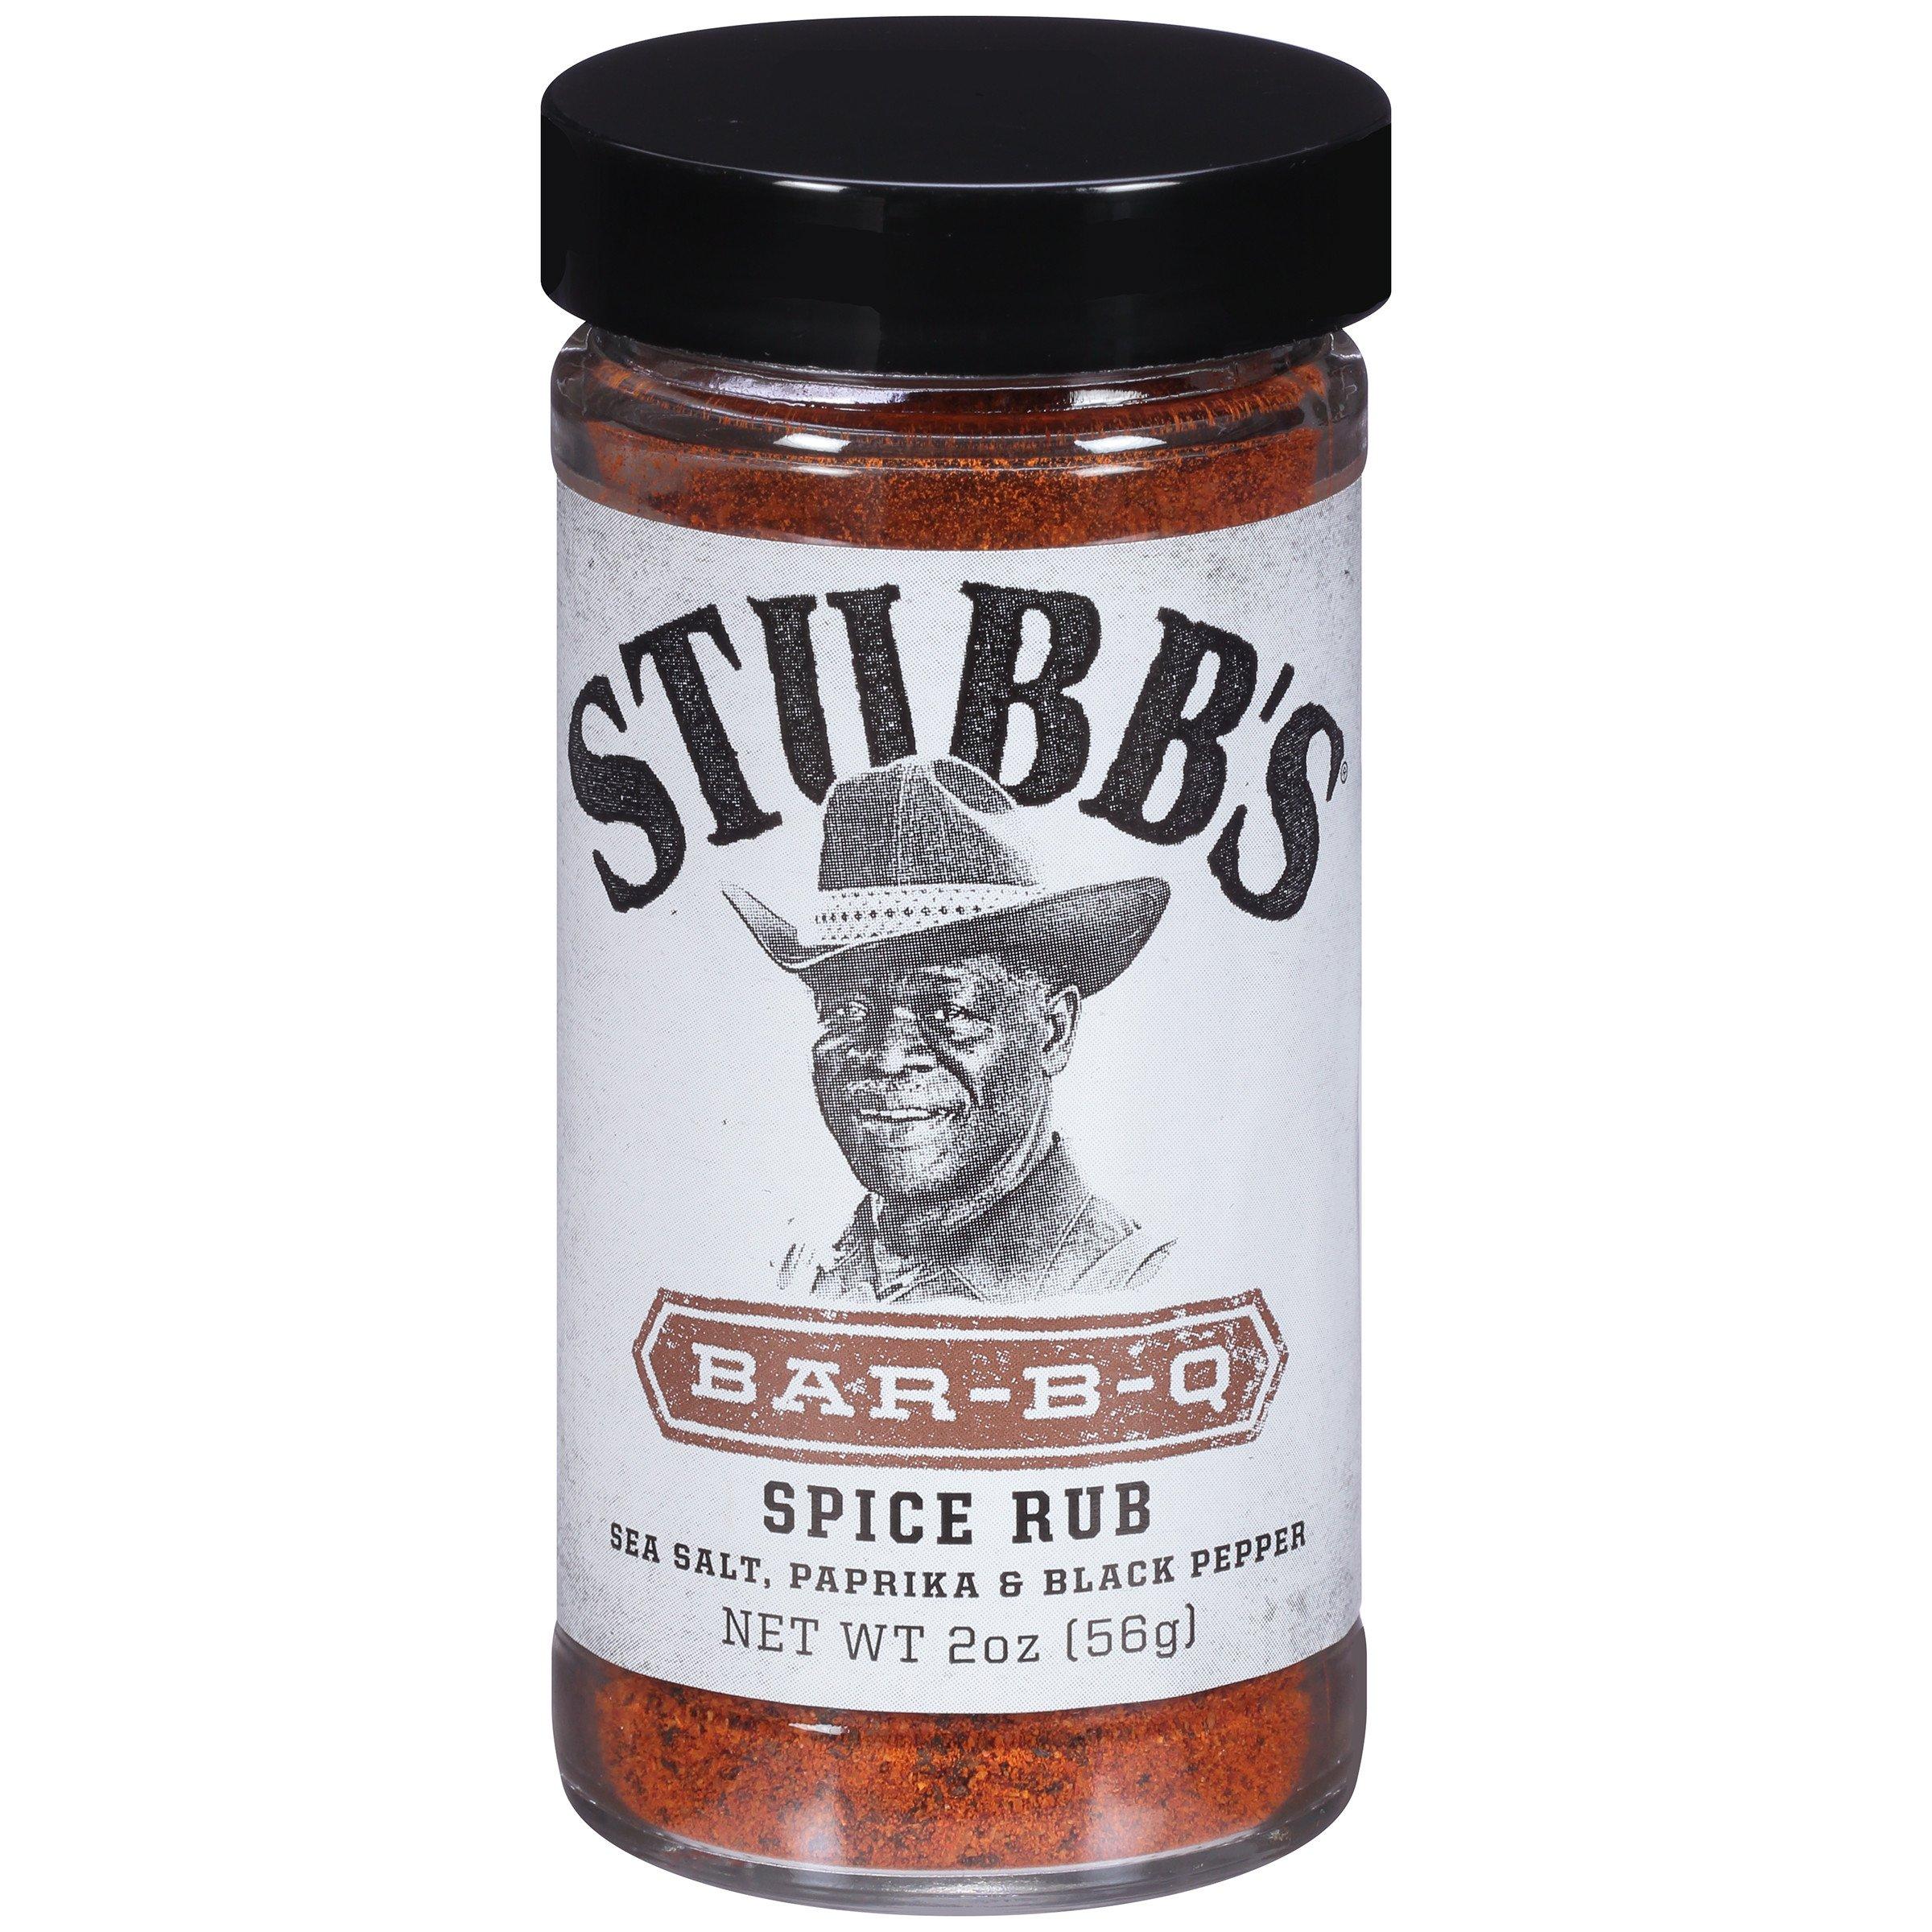 Stubb's Bar-B-Q Spice Rub, 2 ounce (Pack of 6)